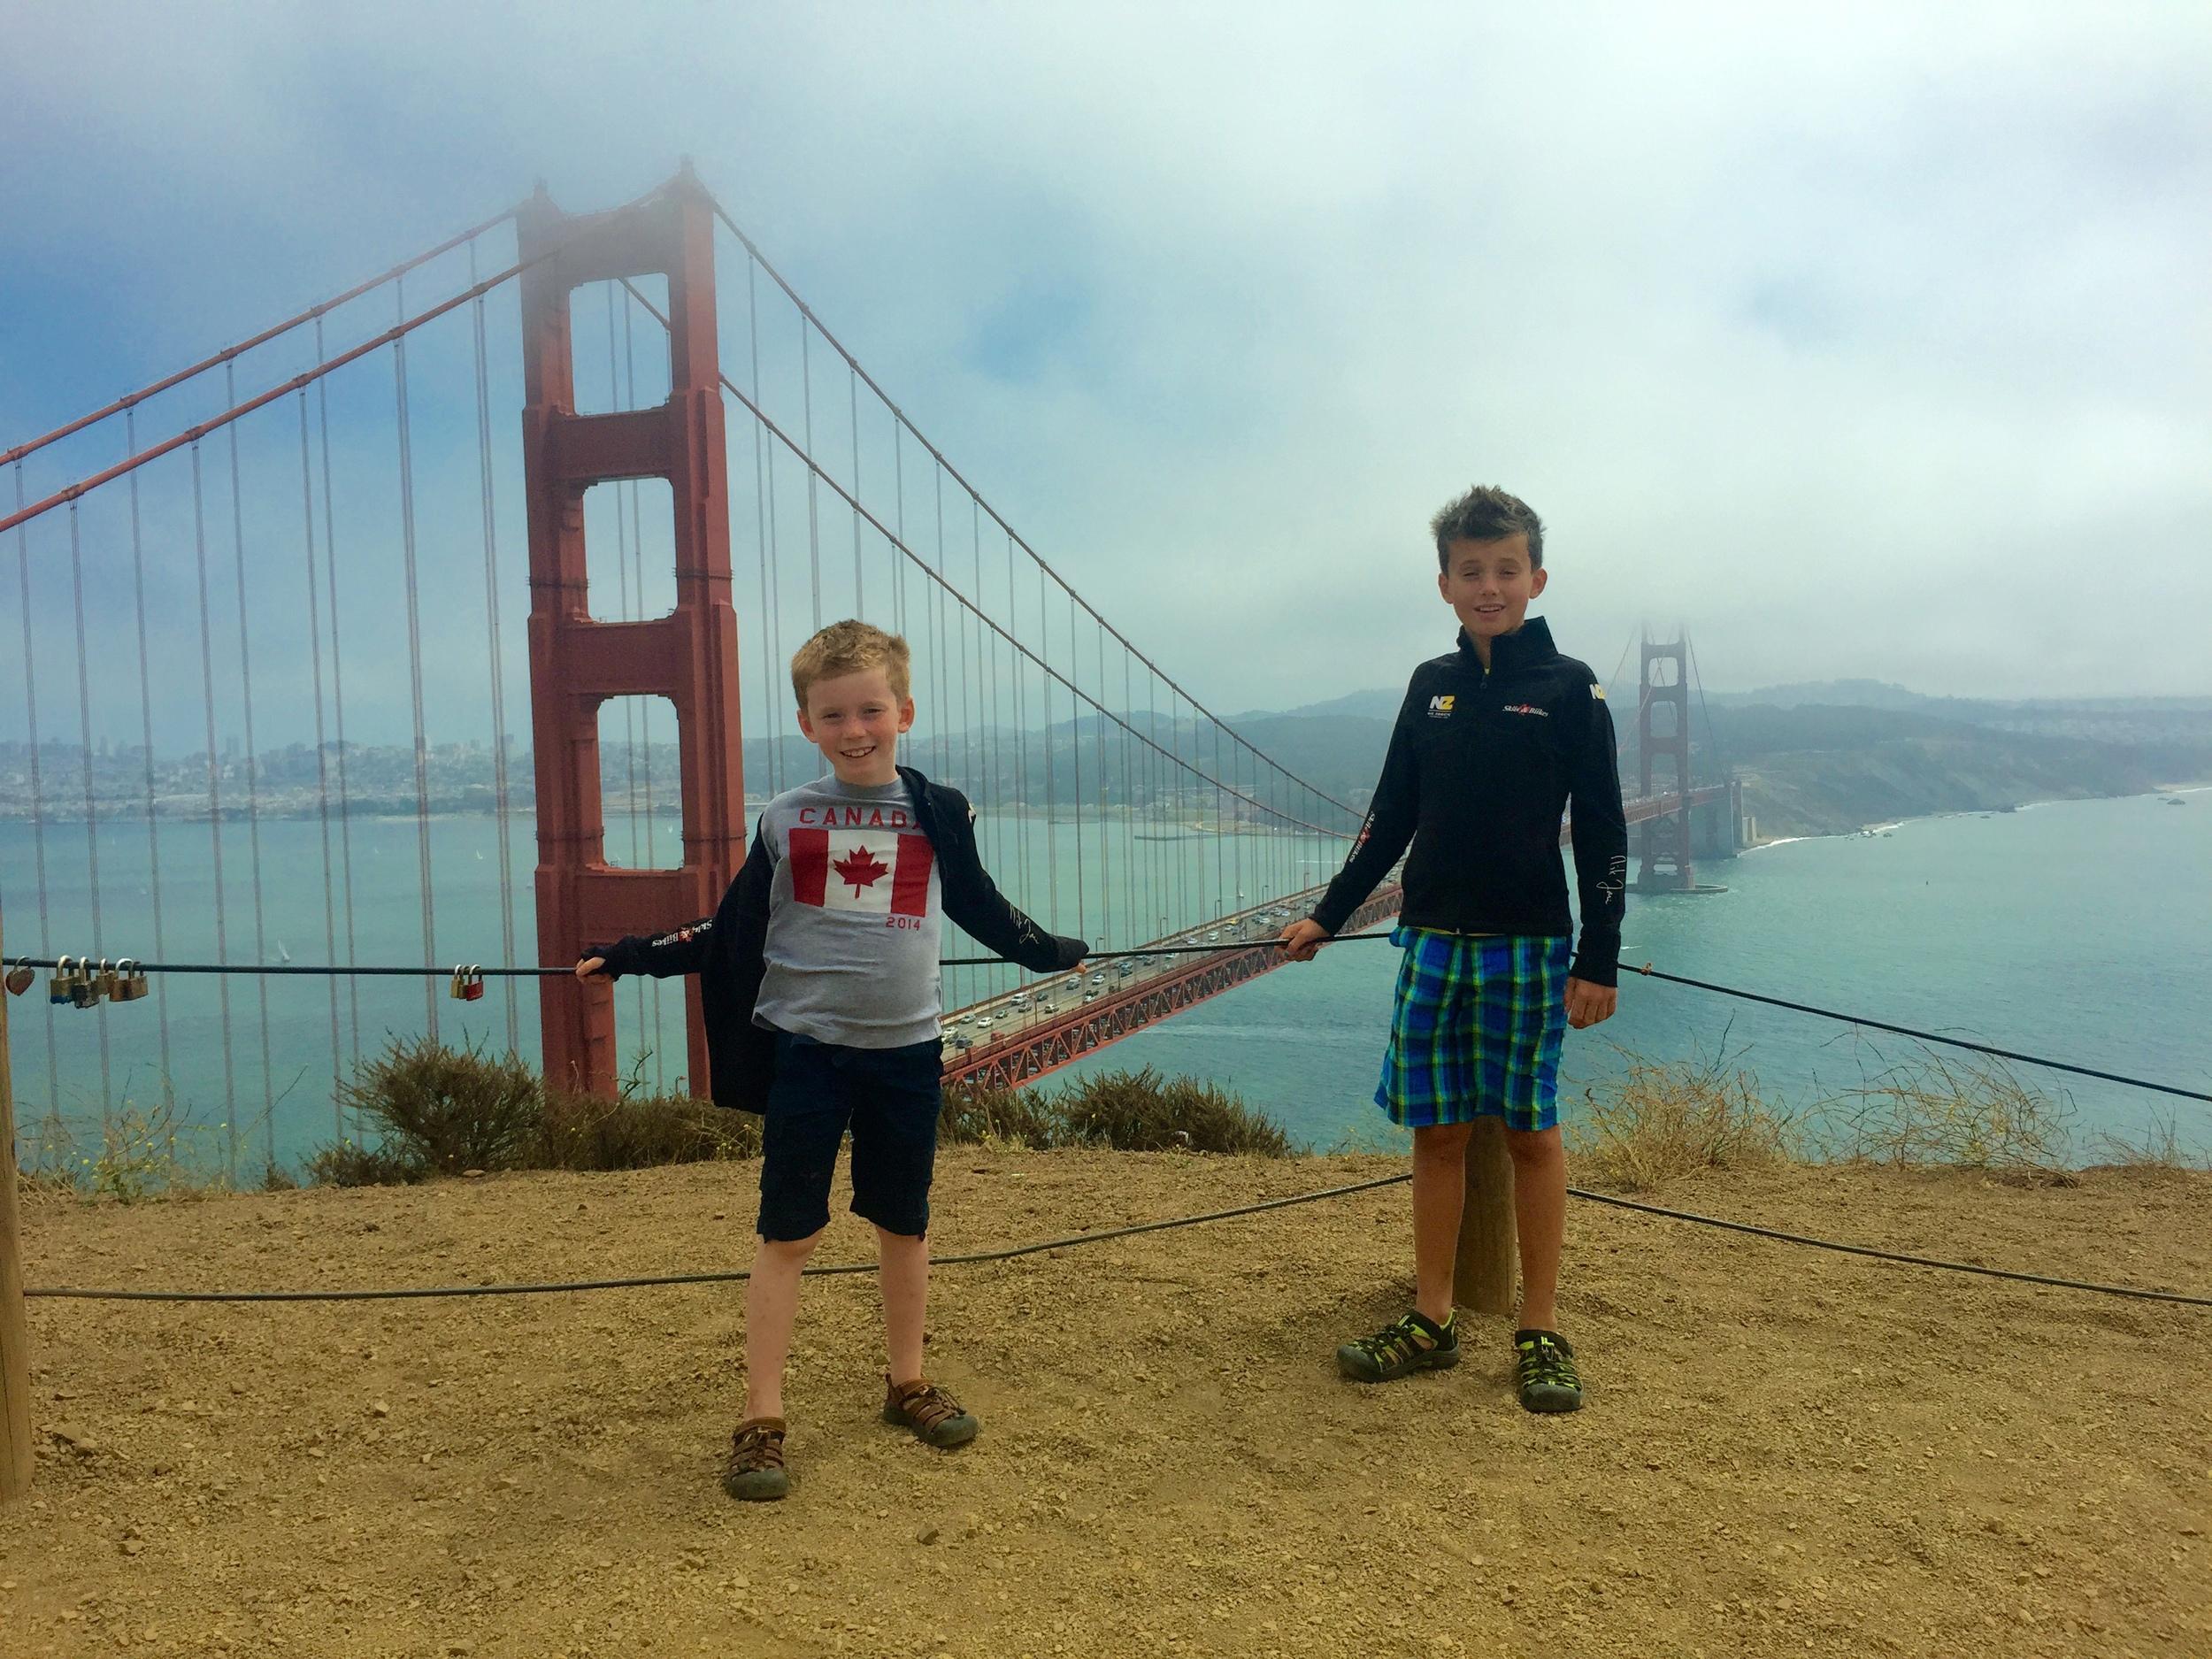 Great Golden Gate!